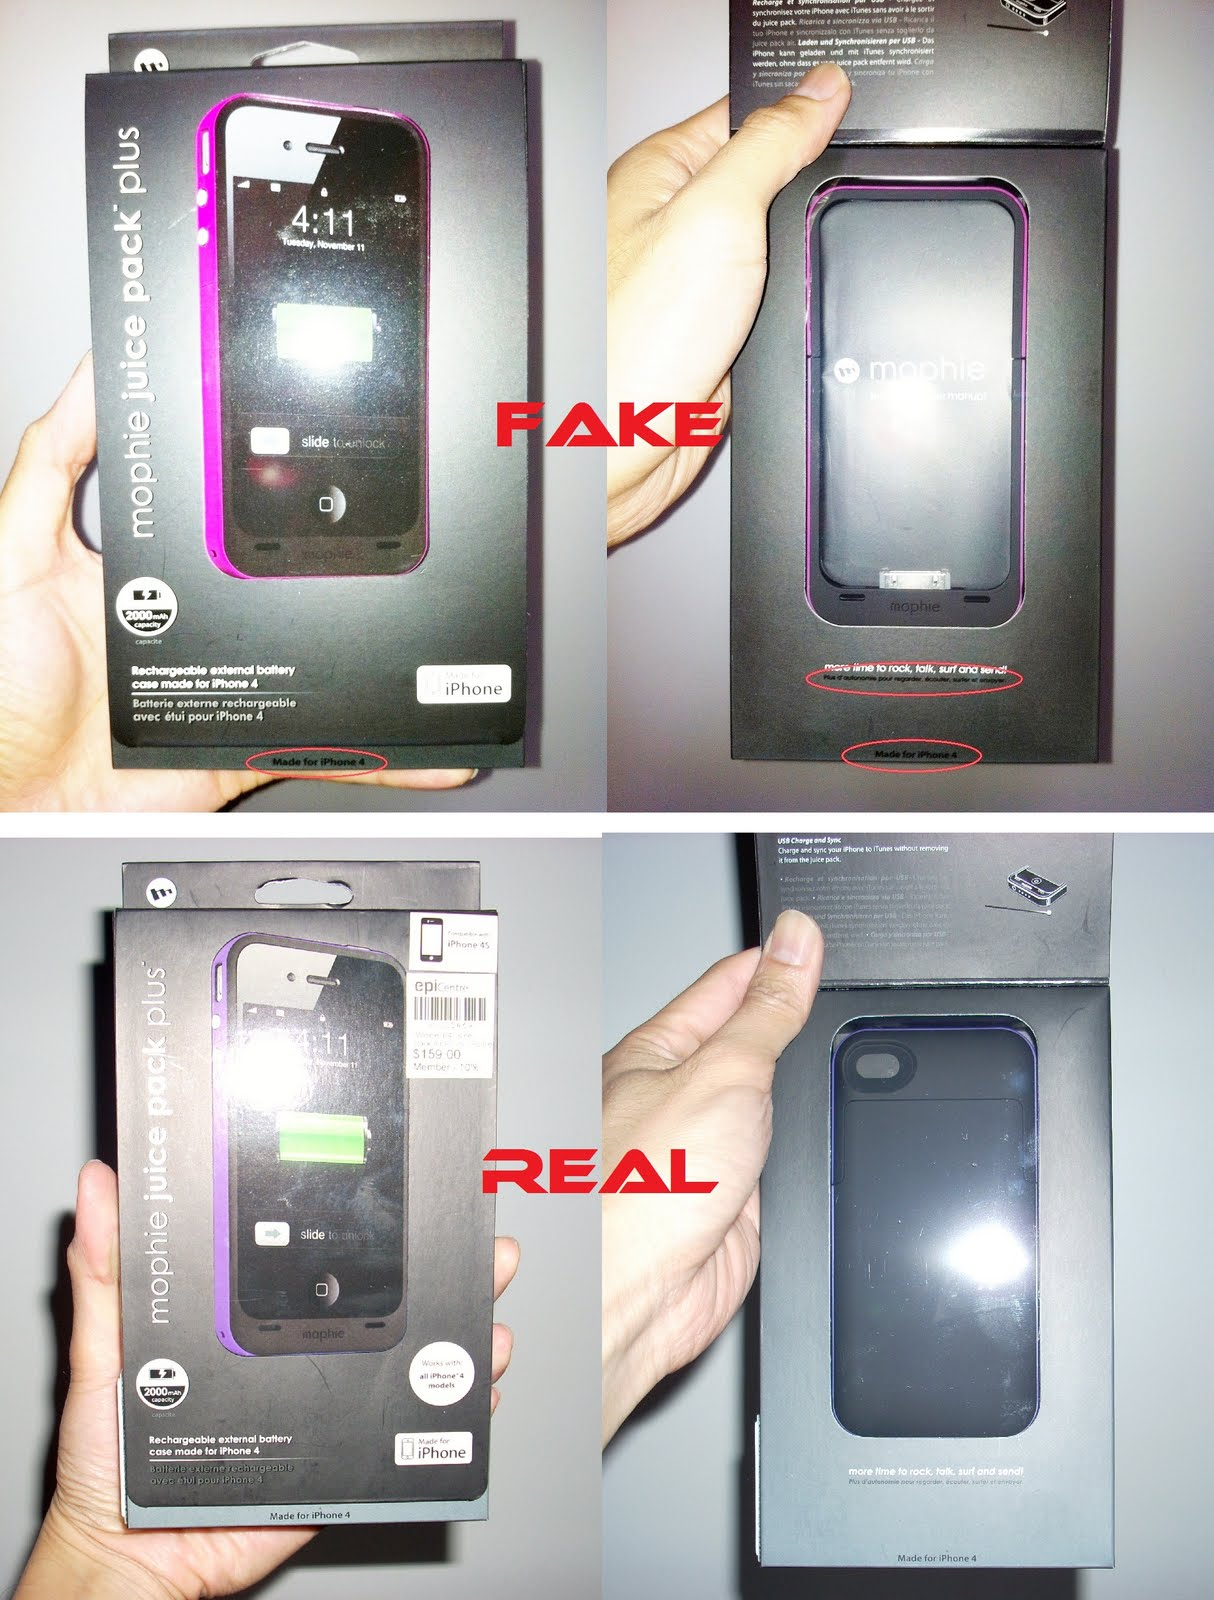 Fake Packaging Packs The Juice Pack Plus Facing Up Real Down